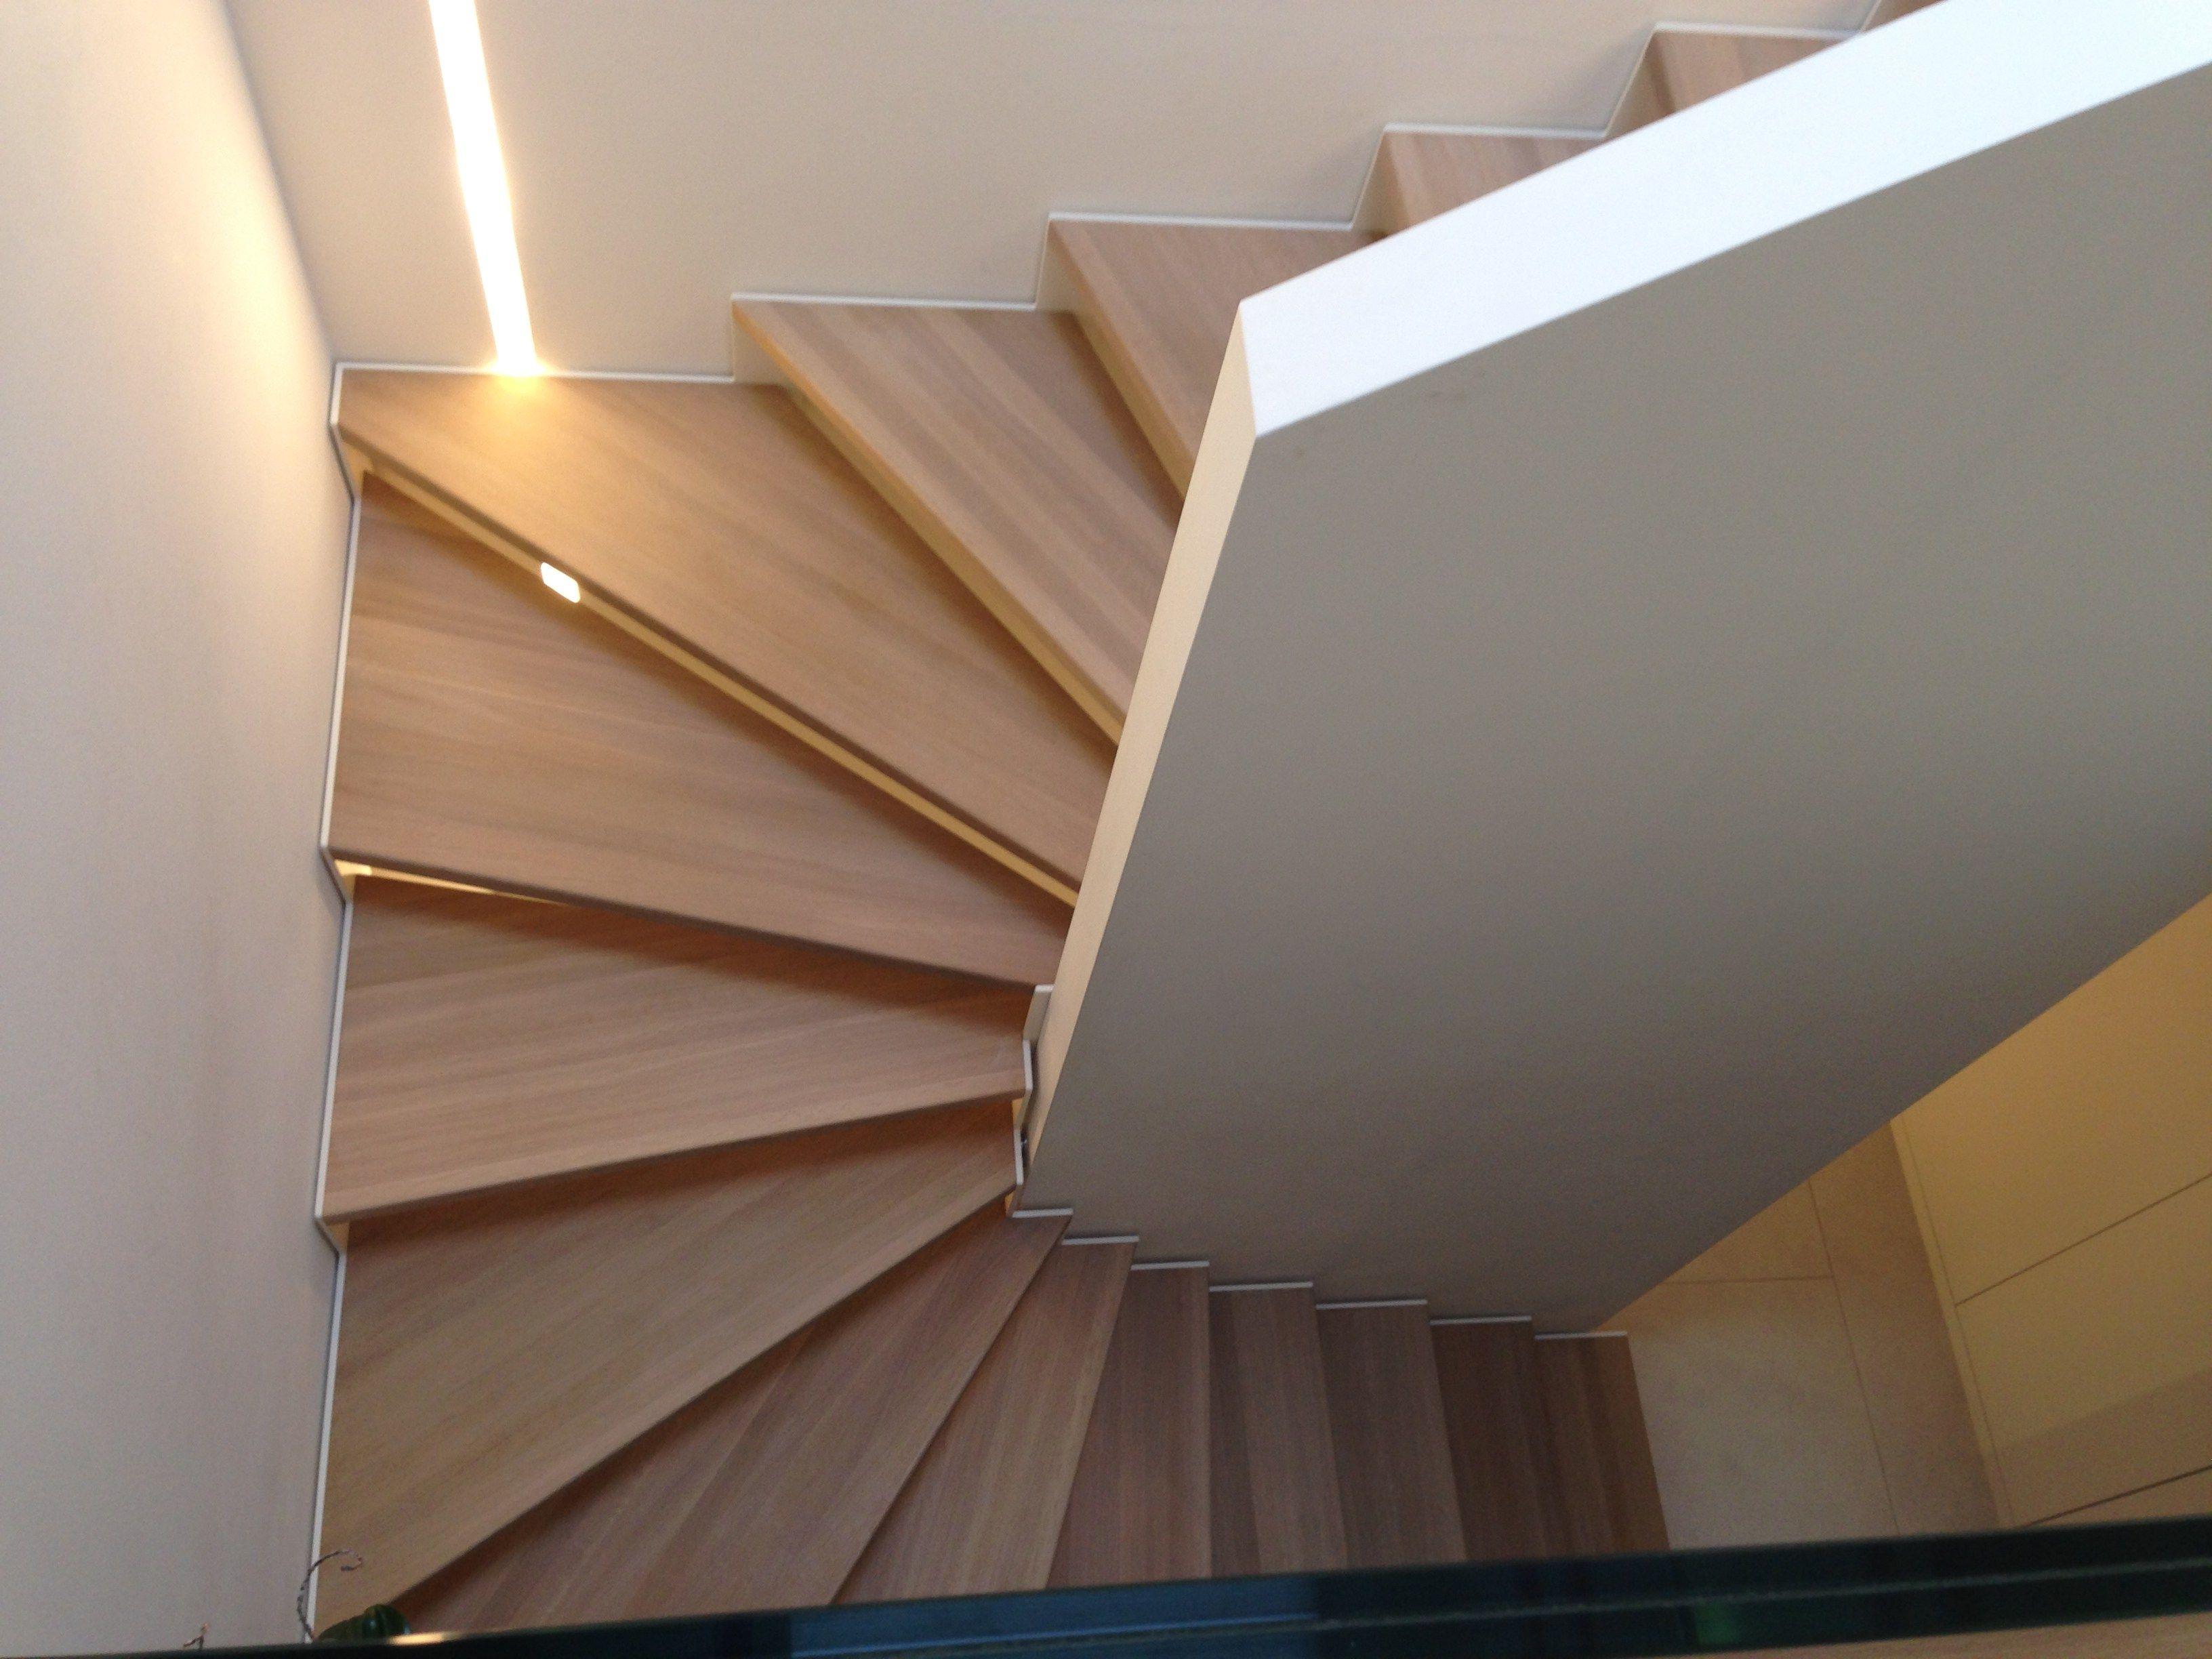 500 offene treppe by interbau suedtirol treppen. Black Bedroom Furniture Sets. Home Design Ideas